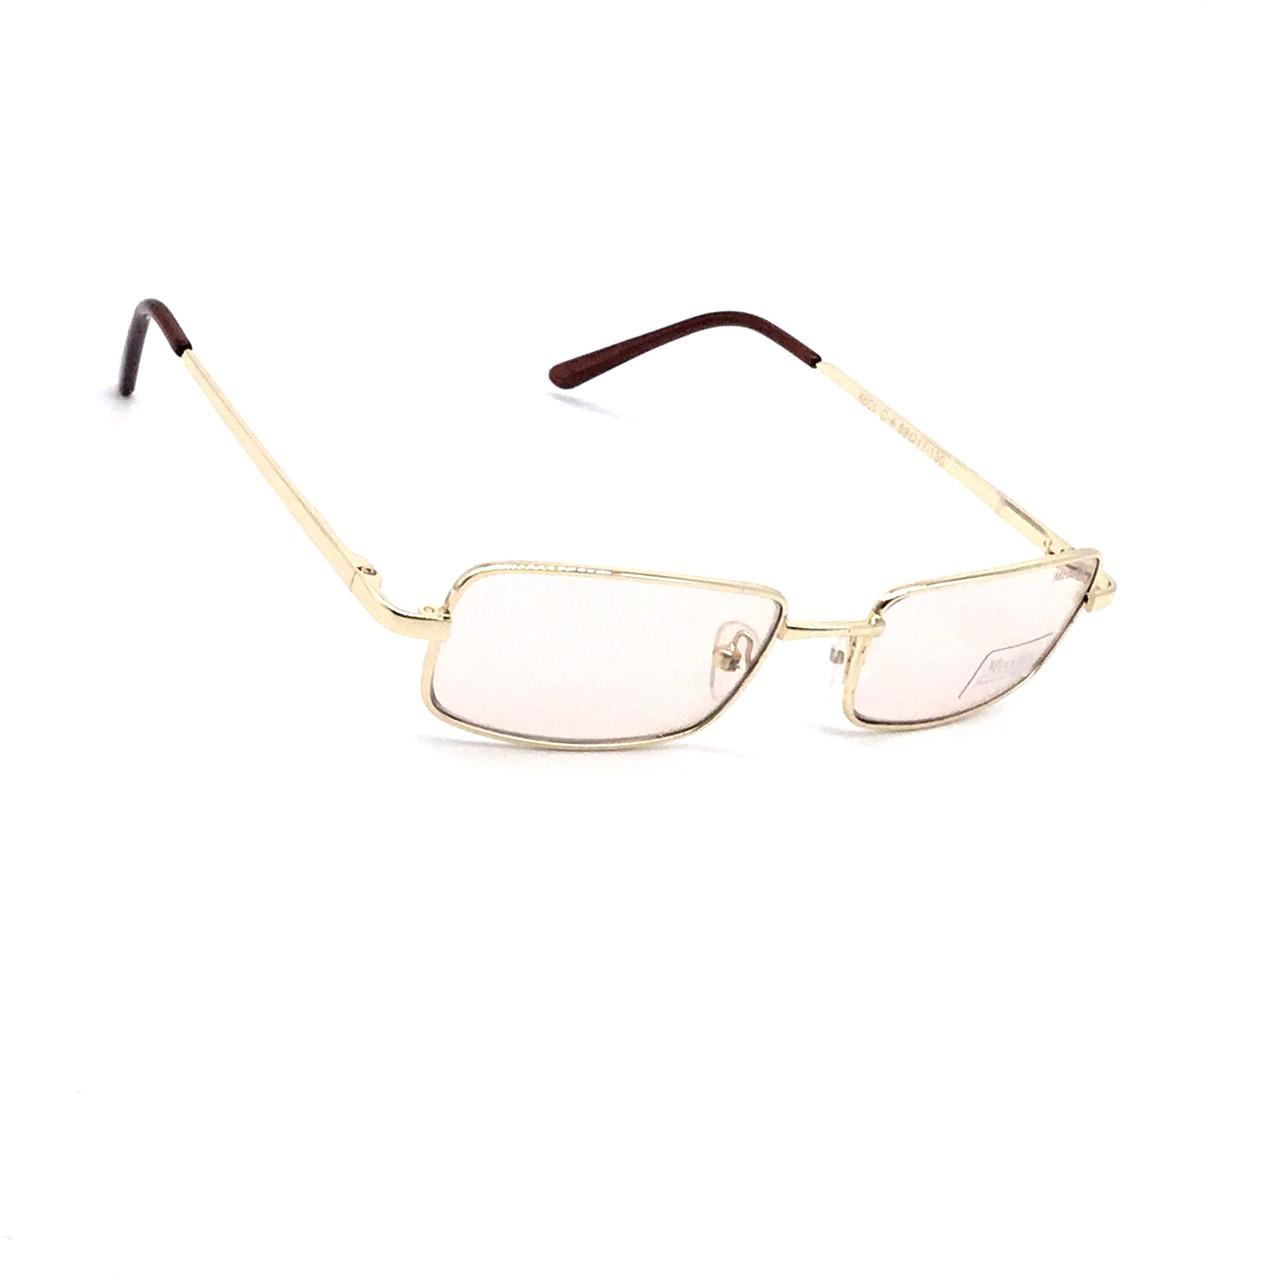 Солнцезащитные очки-хамелеон